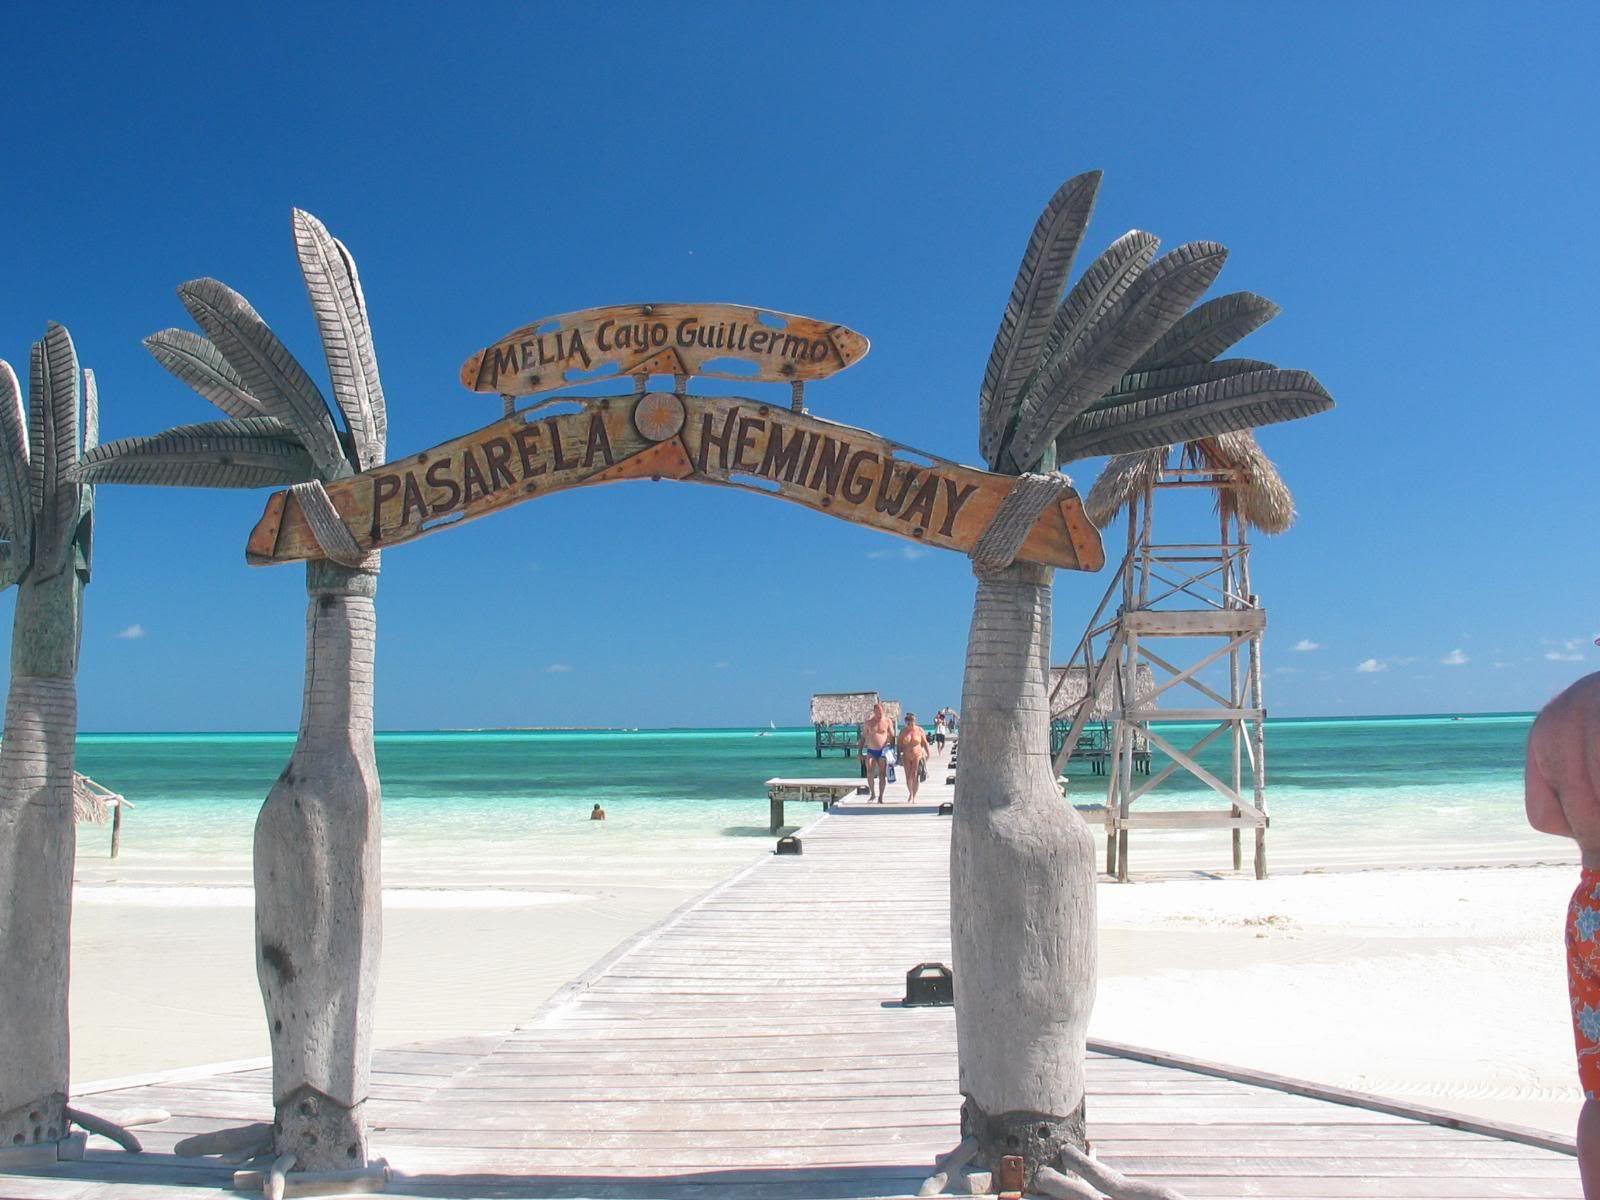 ⭐CUBA VACATION c 2016 Cayo Coco Best Beaches in the World ...  |Beach Cayo Guillermo Cuba